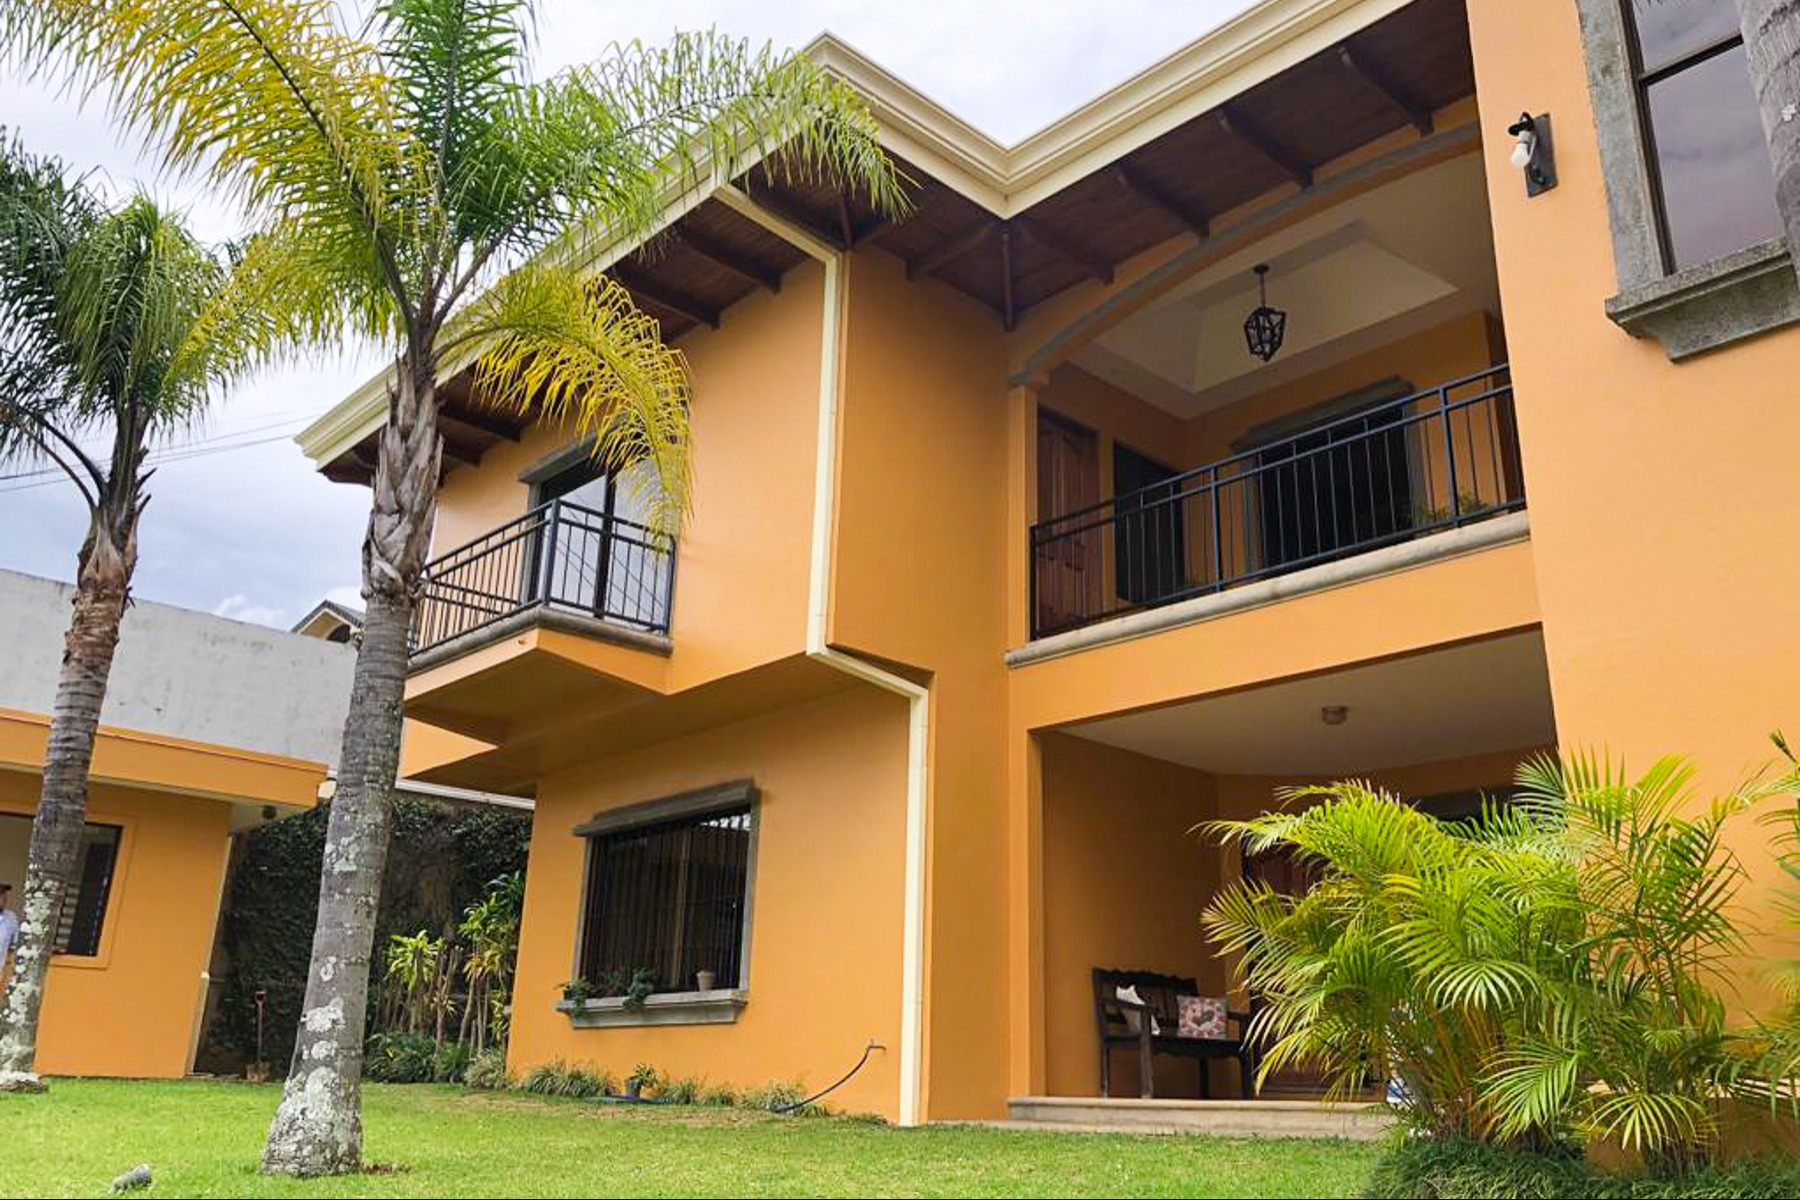 Apartments for Sale at Apartamento en Pinares Curridabat, San Jose Costa Rica